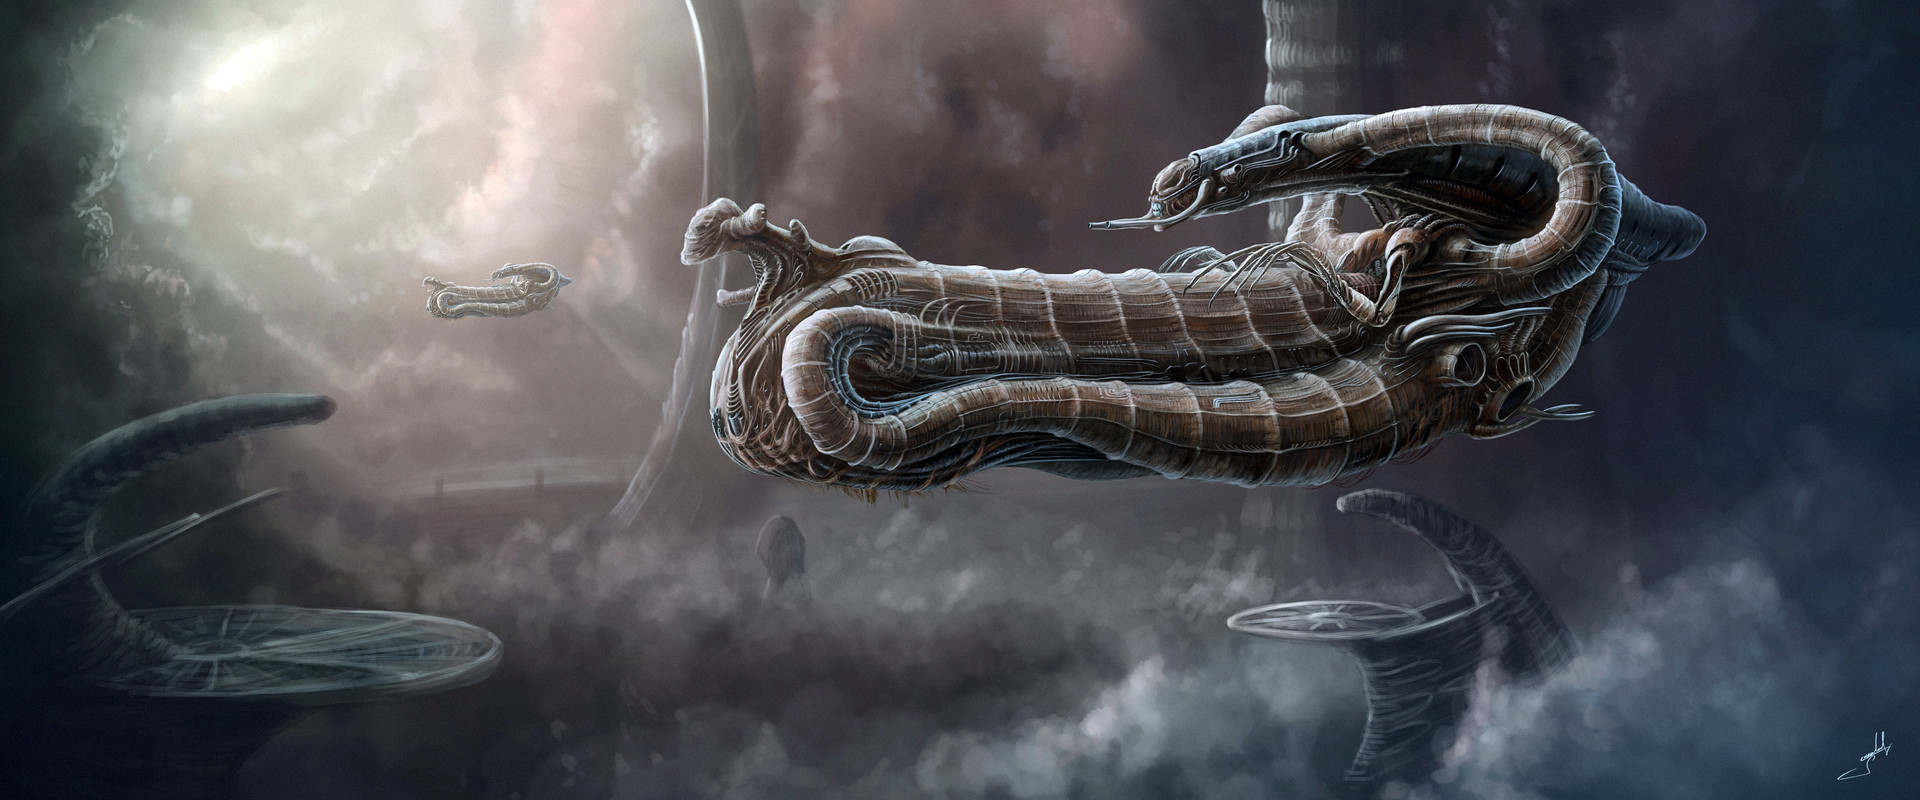 dmitrii-ustinov-alien-hybrid-illustration.jpg